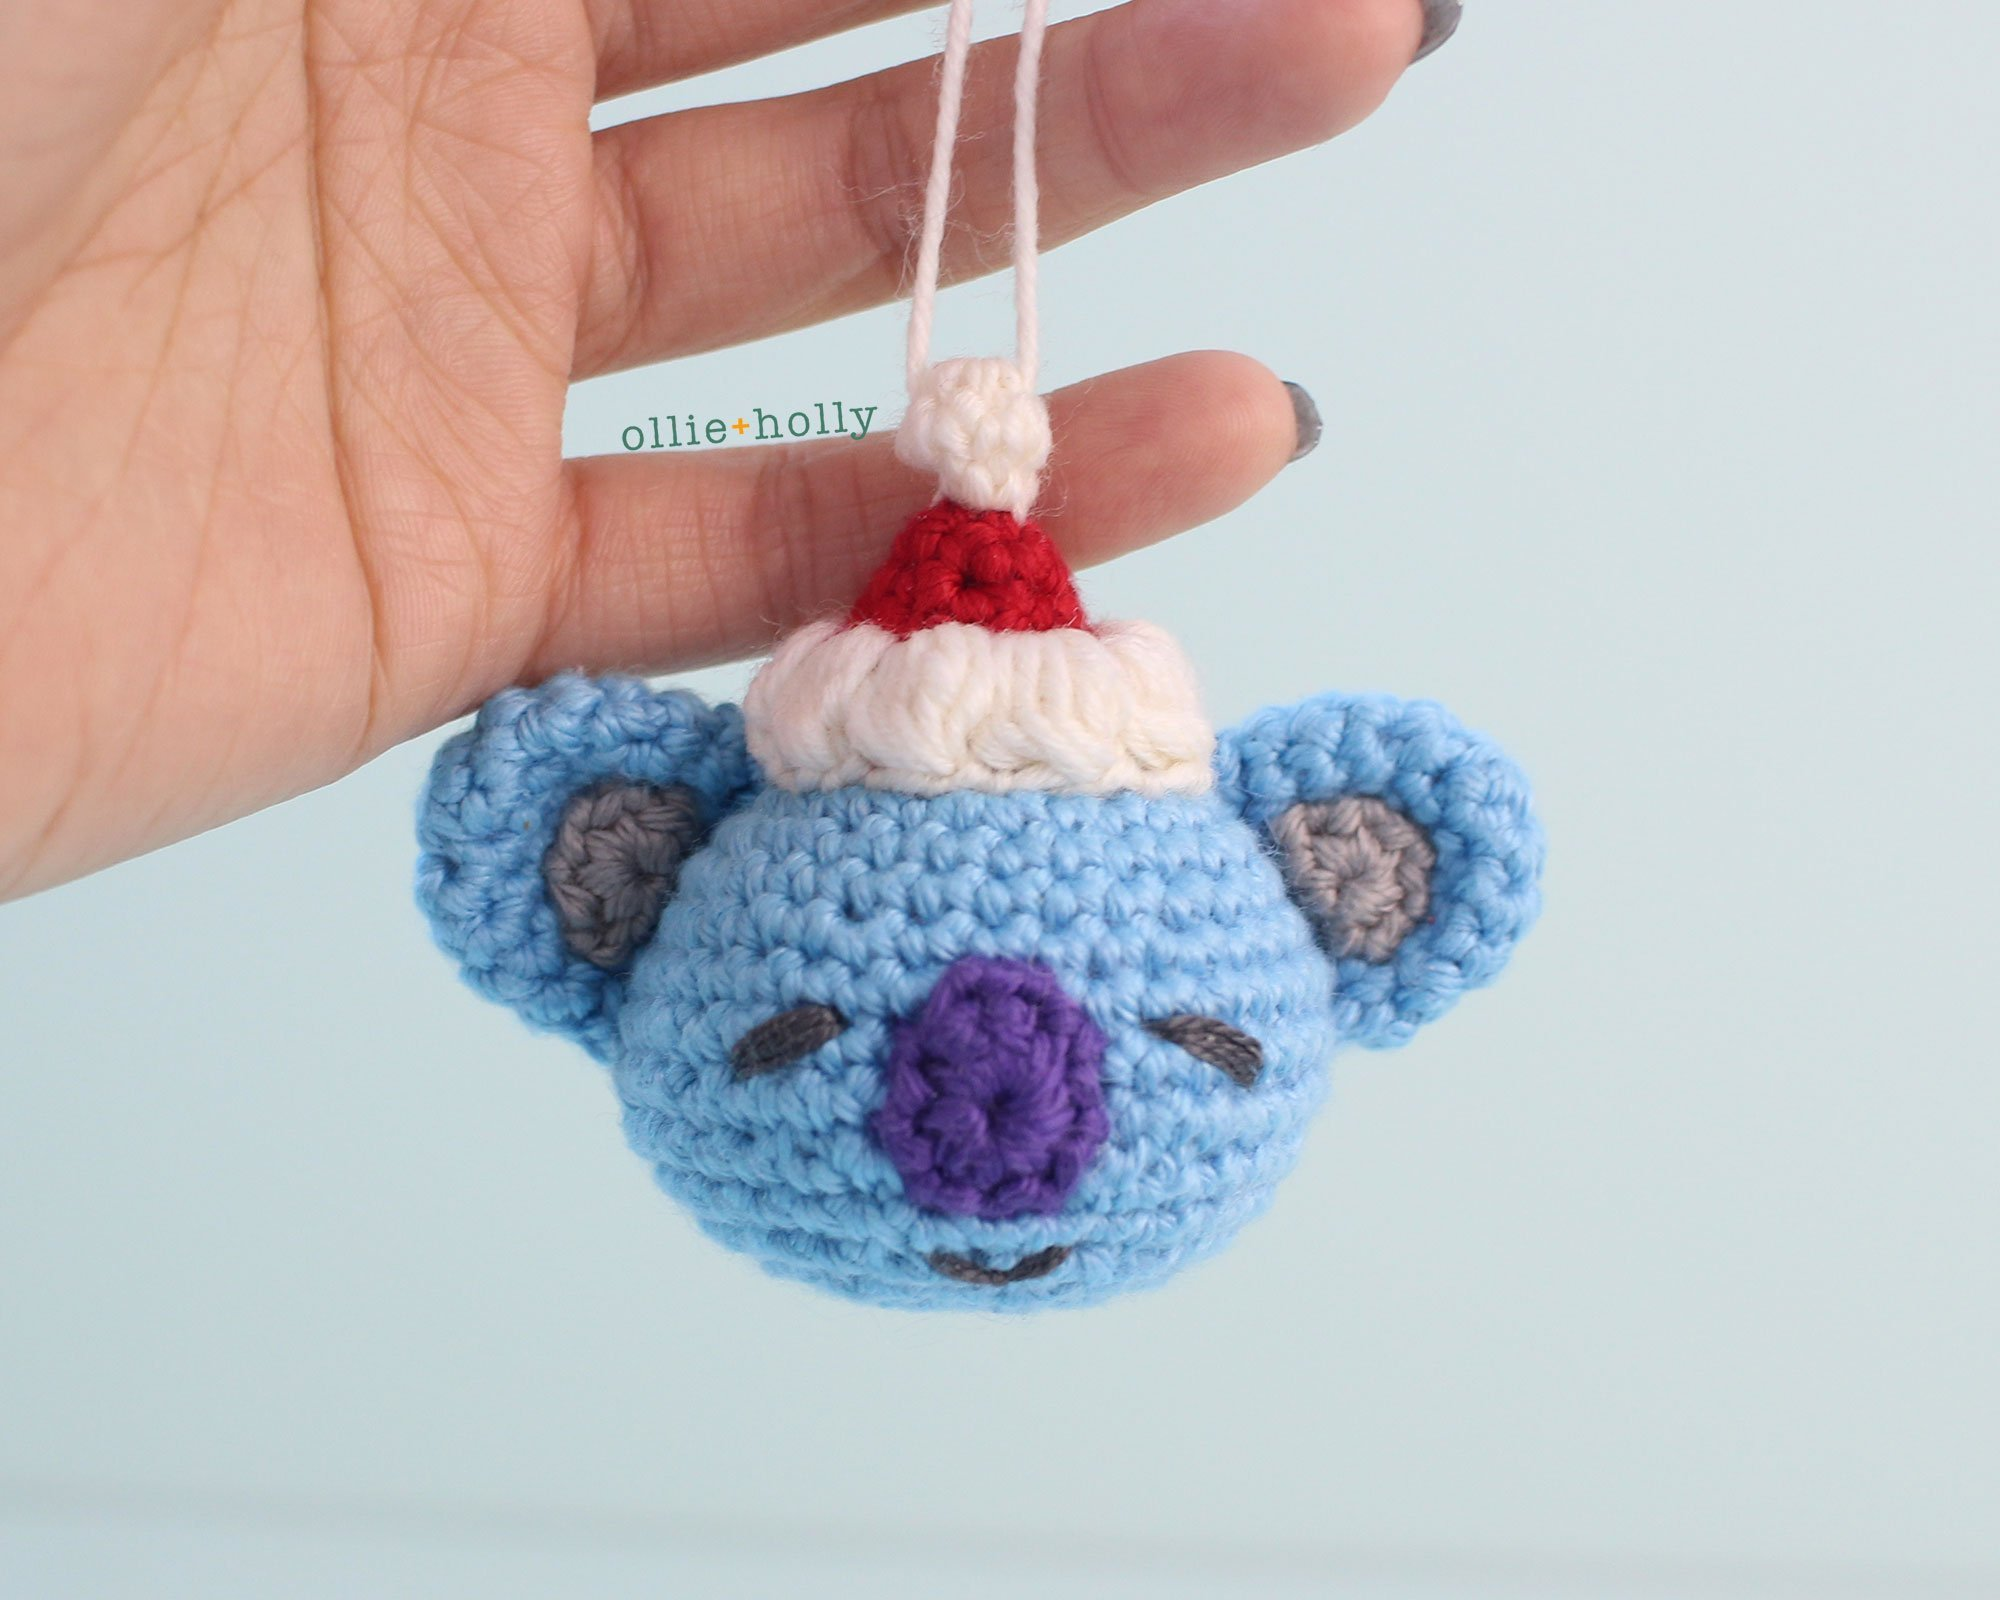 Free BT21 Koya Christmas Ornament Amigurumi Crochet Pattern Complete